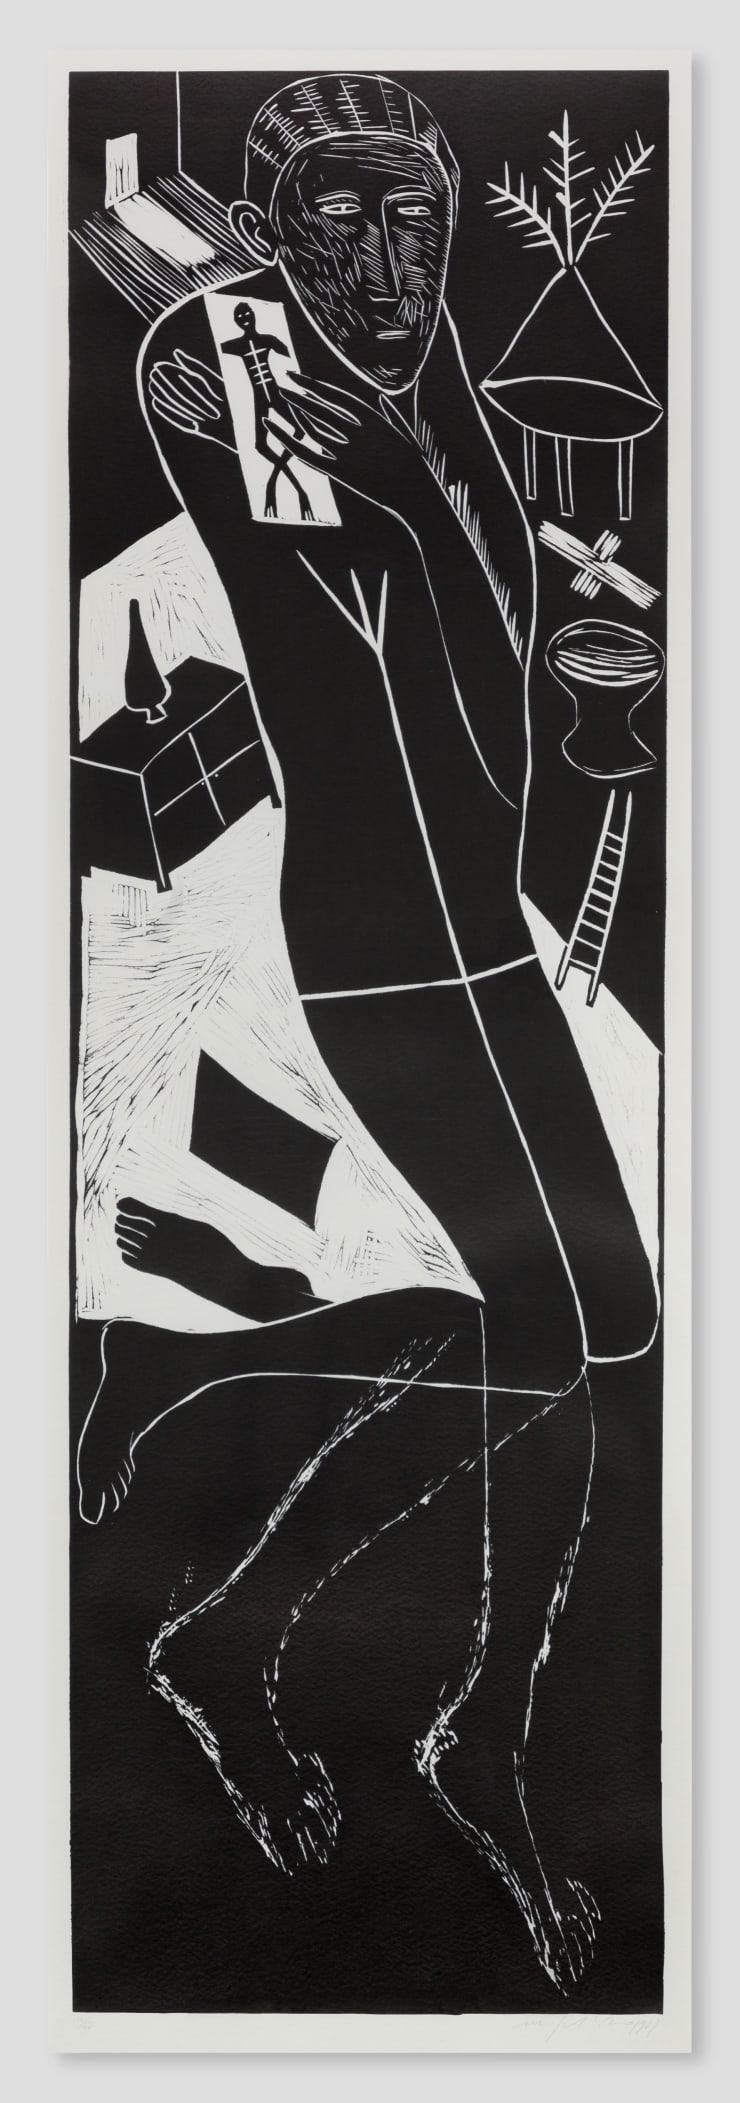 Mimmo Paladino, Atlantico II ( Figure Kneeling with Ladder & Chest of Drawers), 1987